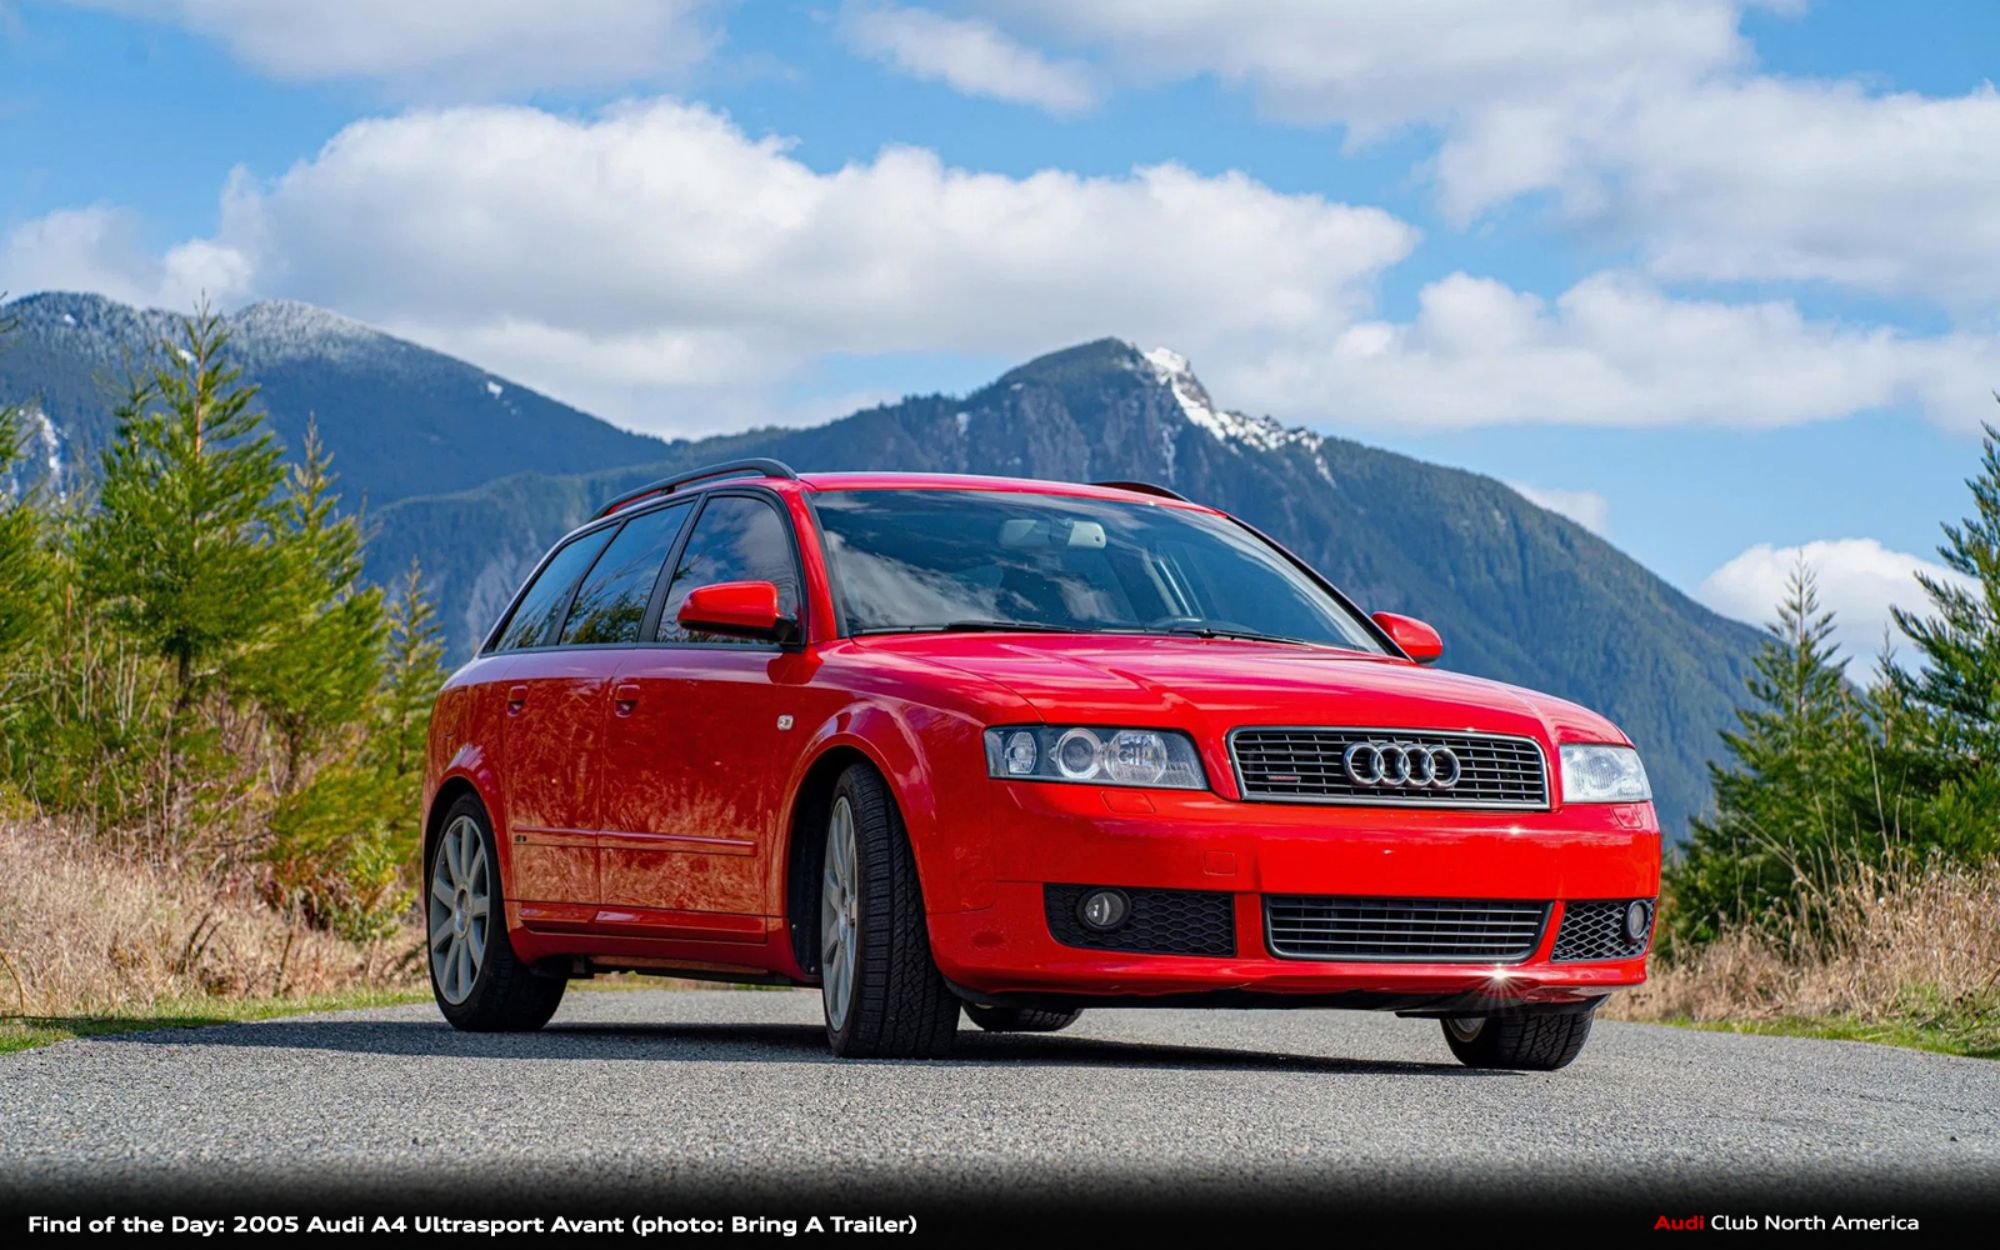 Find of the Day: 2005 Audi A4 Ultrasport Avant